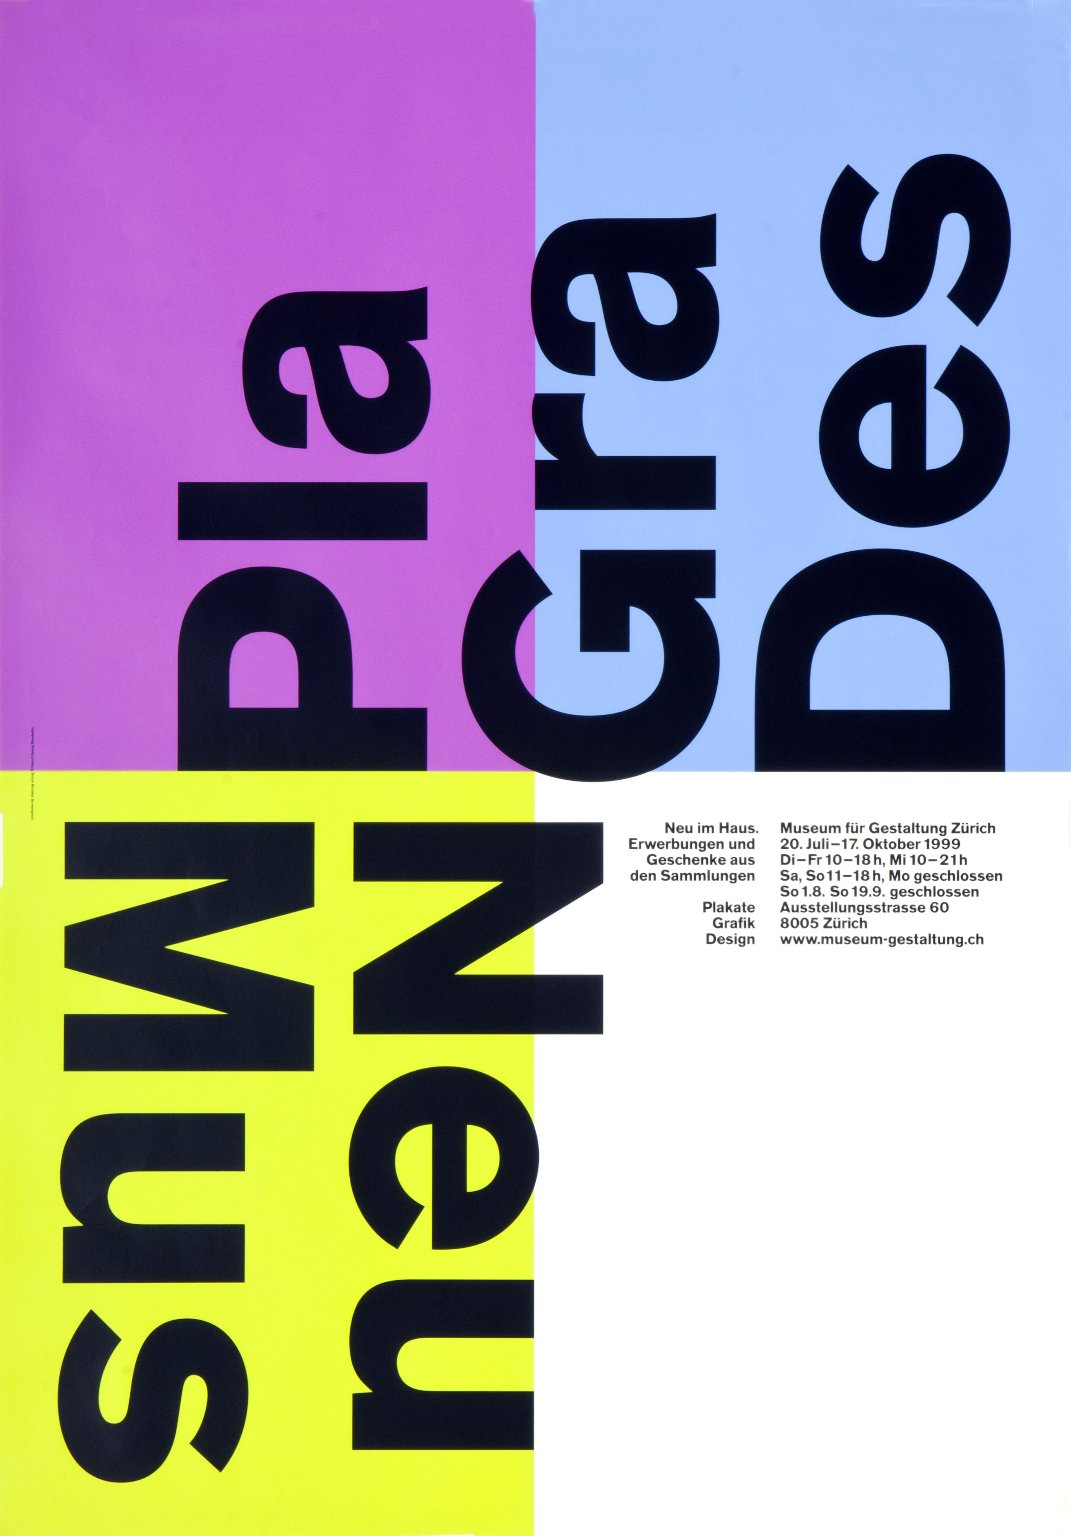 Pla Gra Des (Plakate Grafik Design)